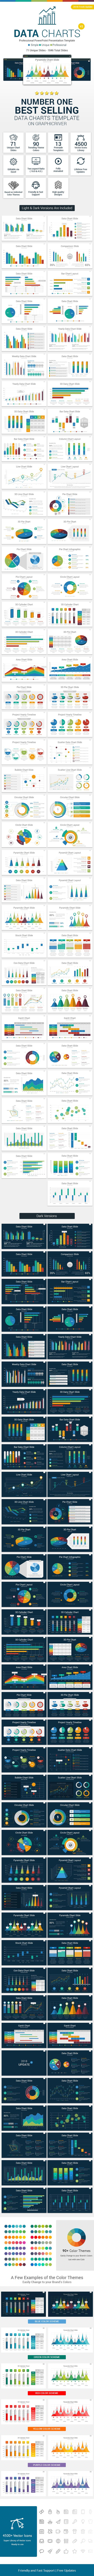 Data Charts PowerPoint Presentation Template - Finance PowerPoint Templates